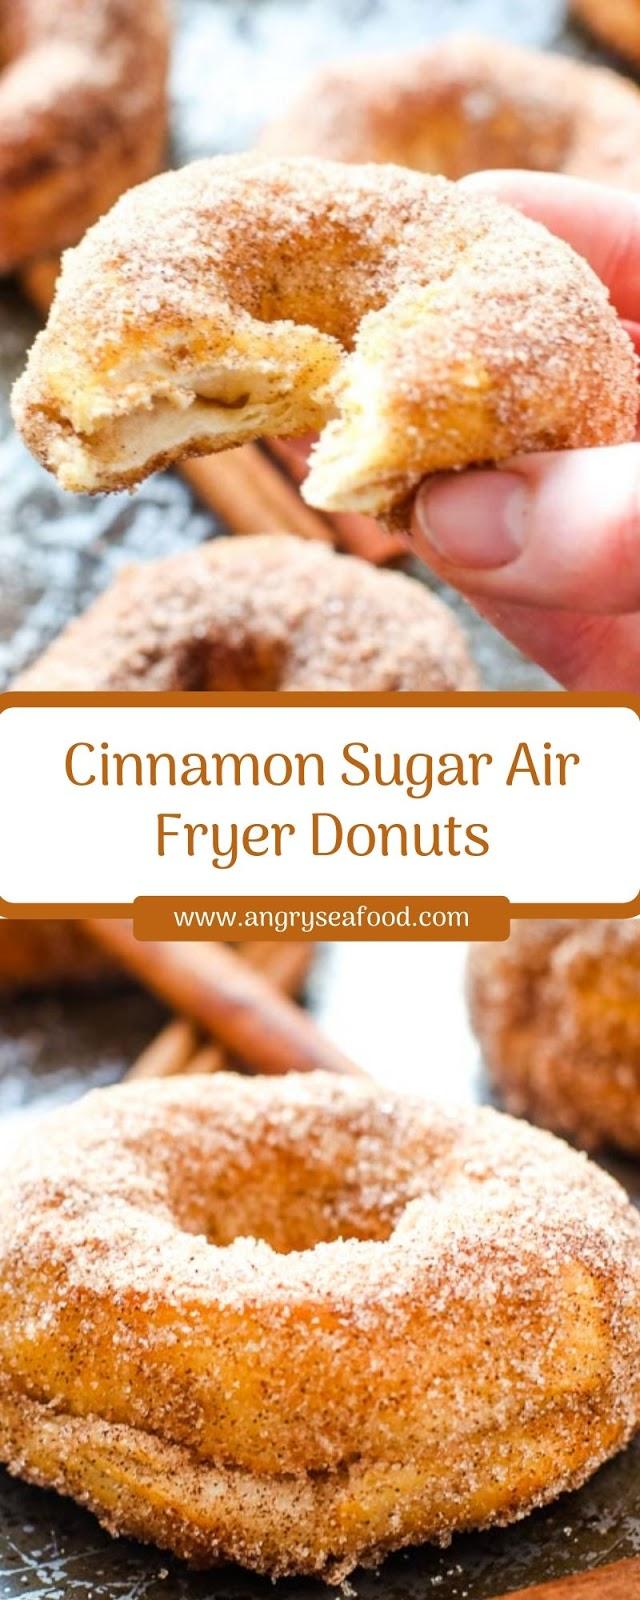 Cinnamon Sugar Air Fryer Donuts